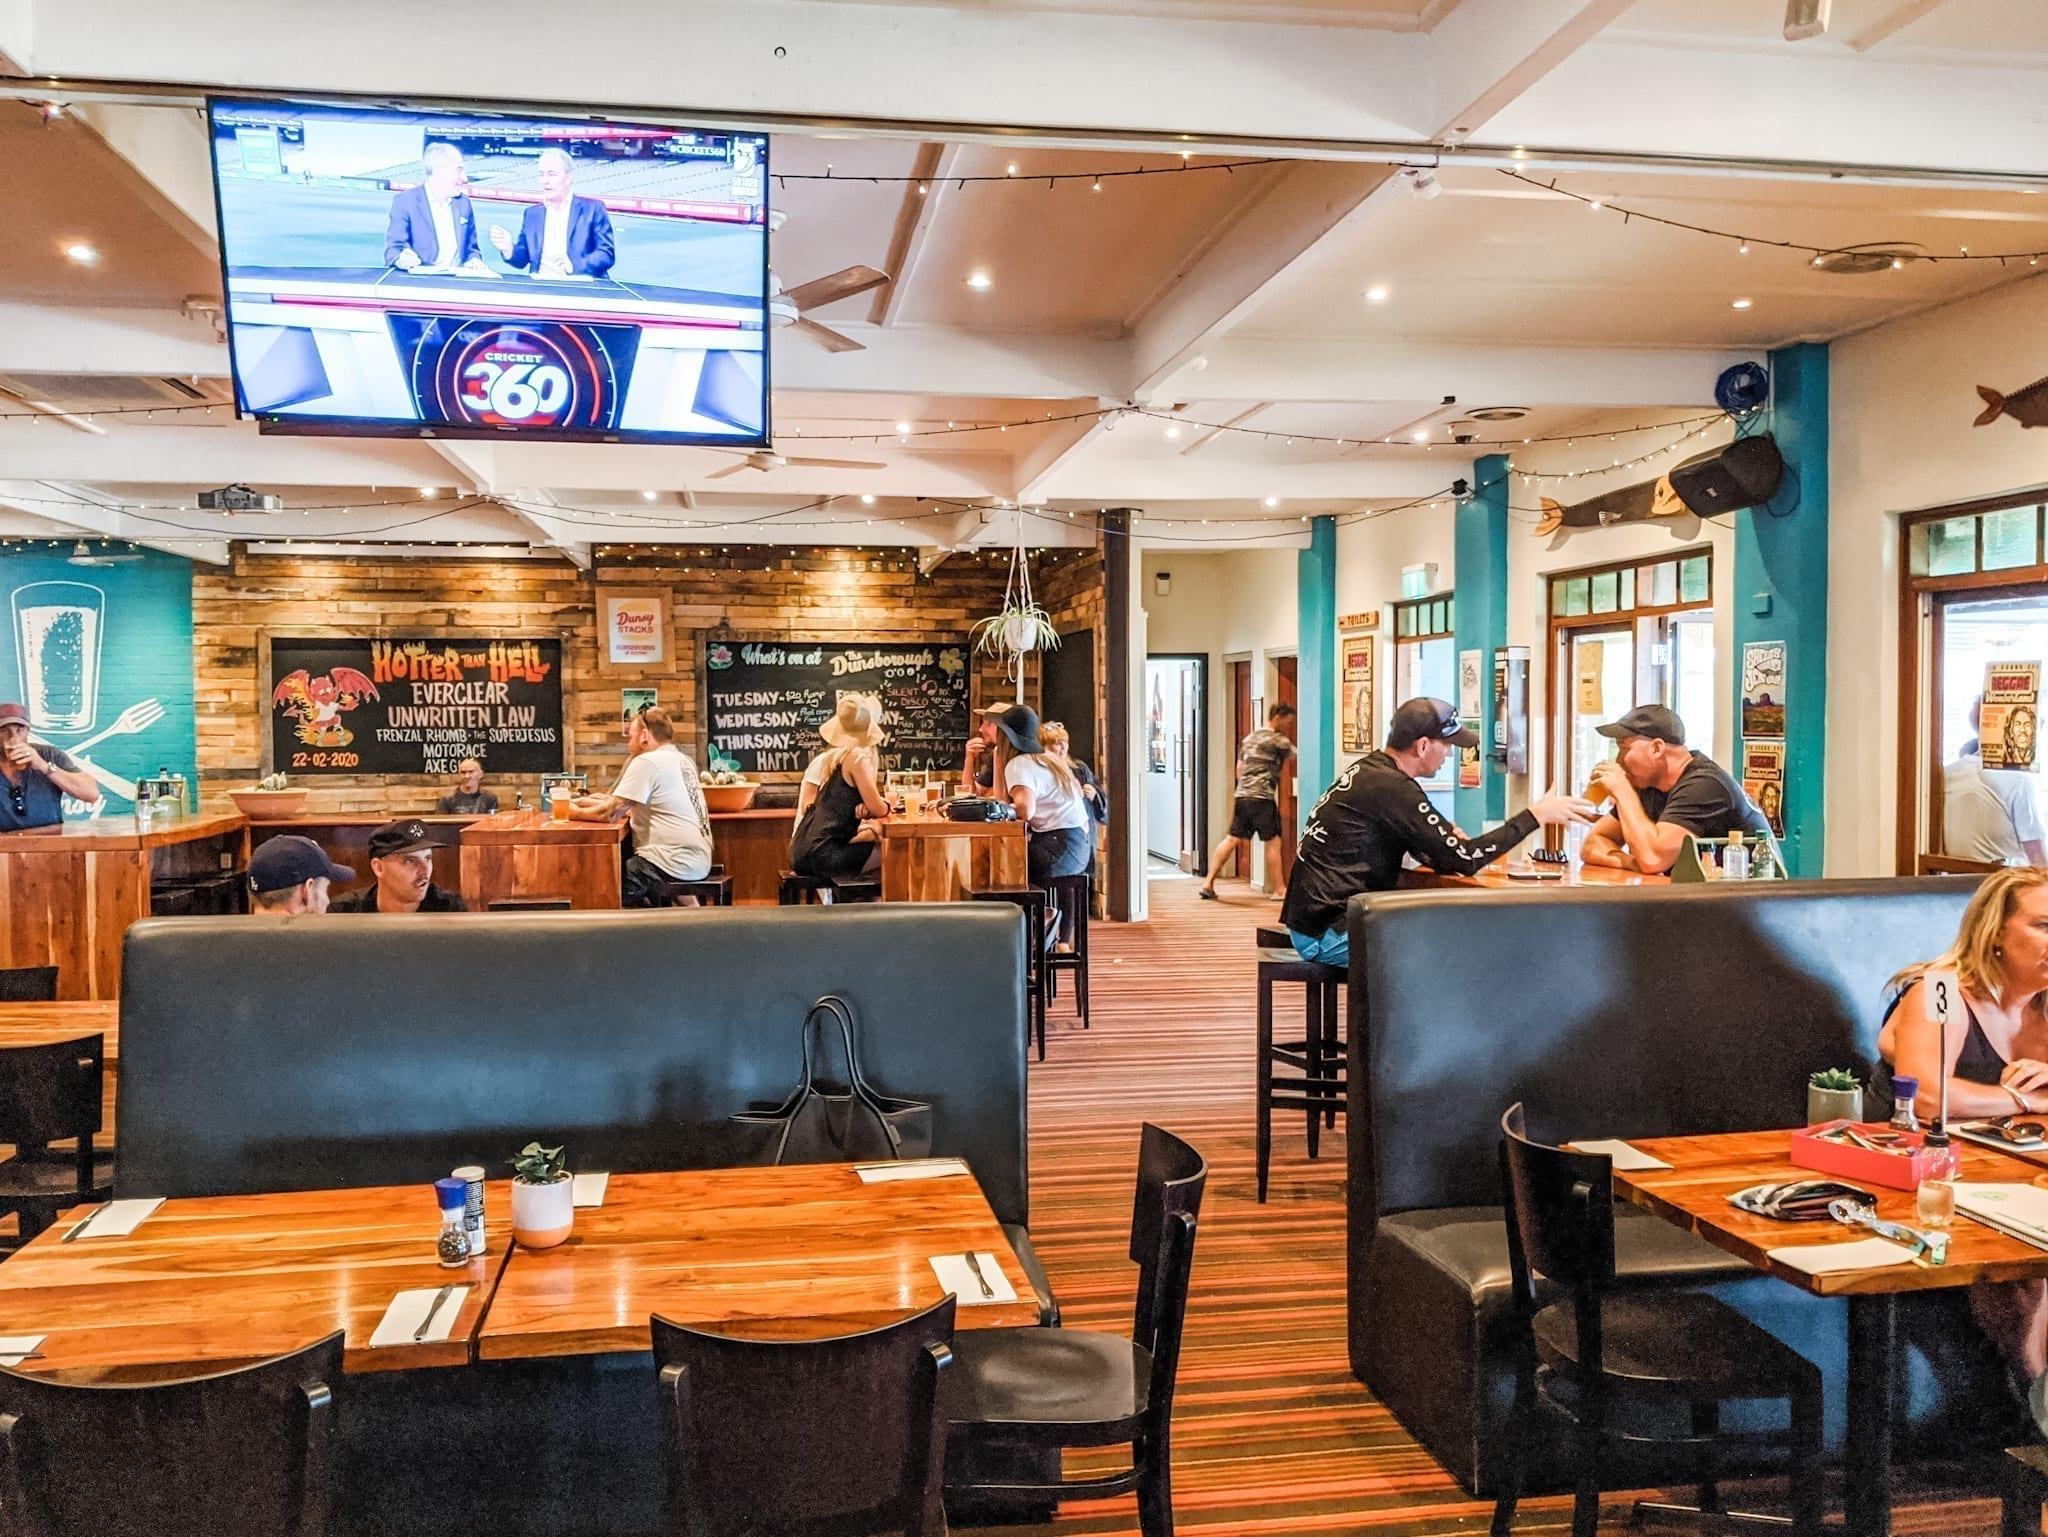 The Dunsborough Tavern